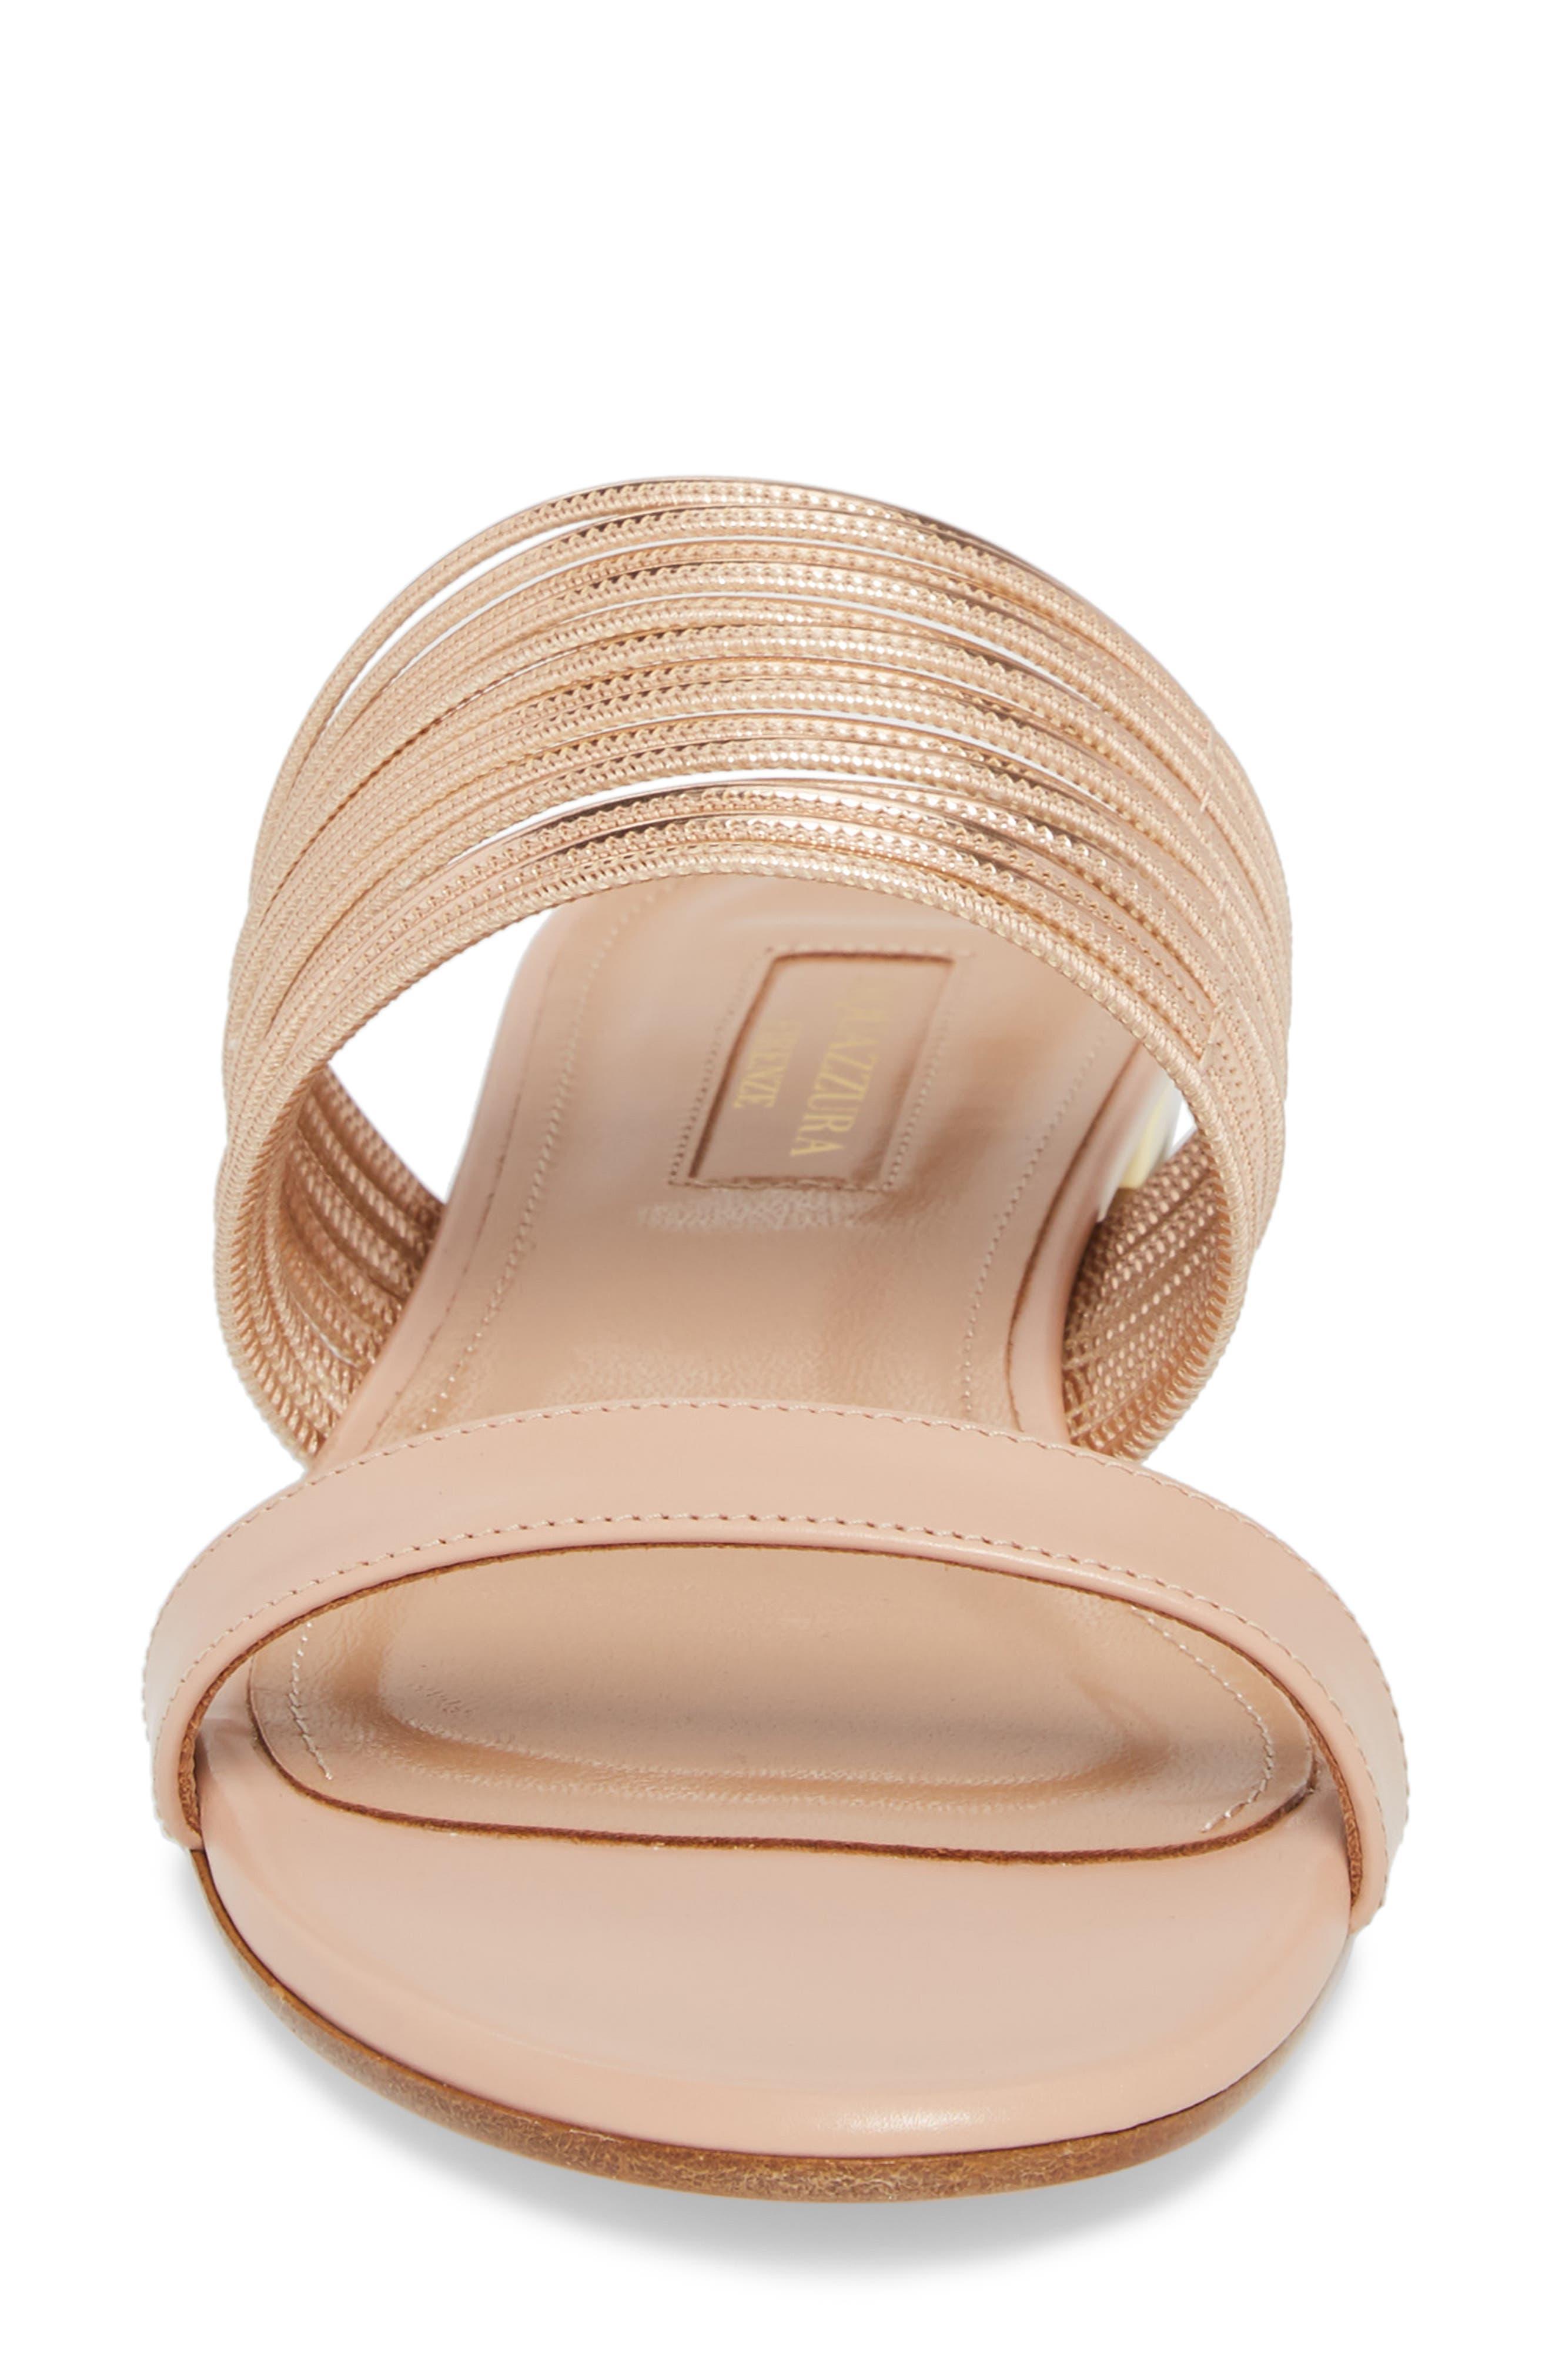 Rendezvous Metallic Sandal,                             Alternate thumbnail 4, color,                             POWDER PINK/CIPRIA